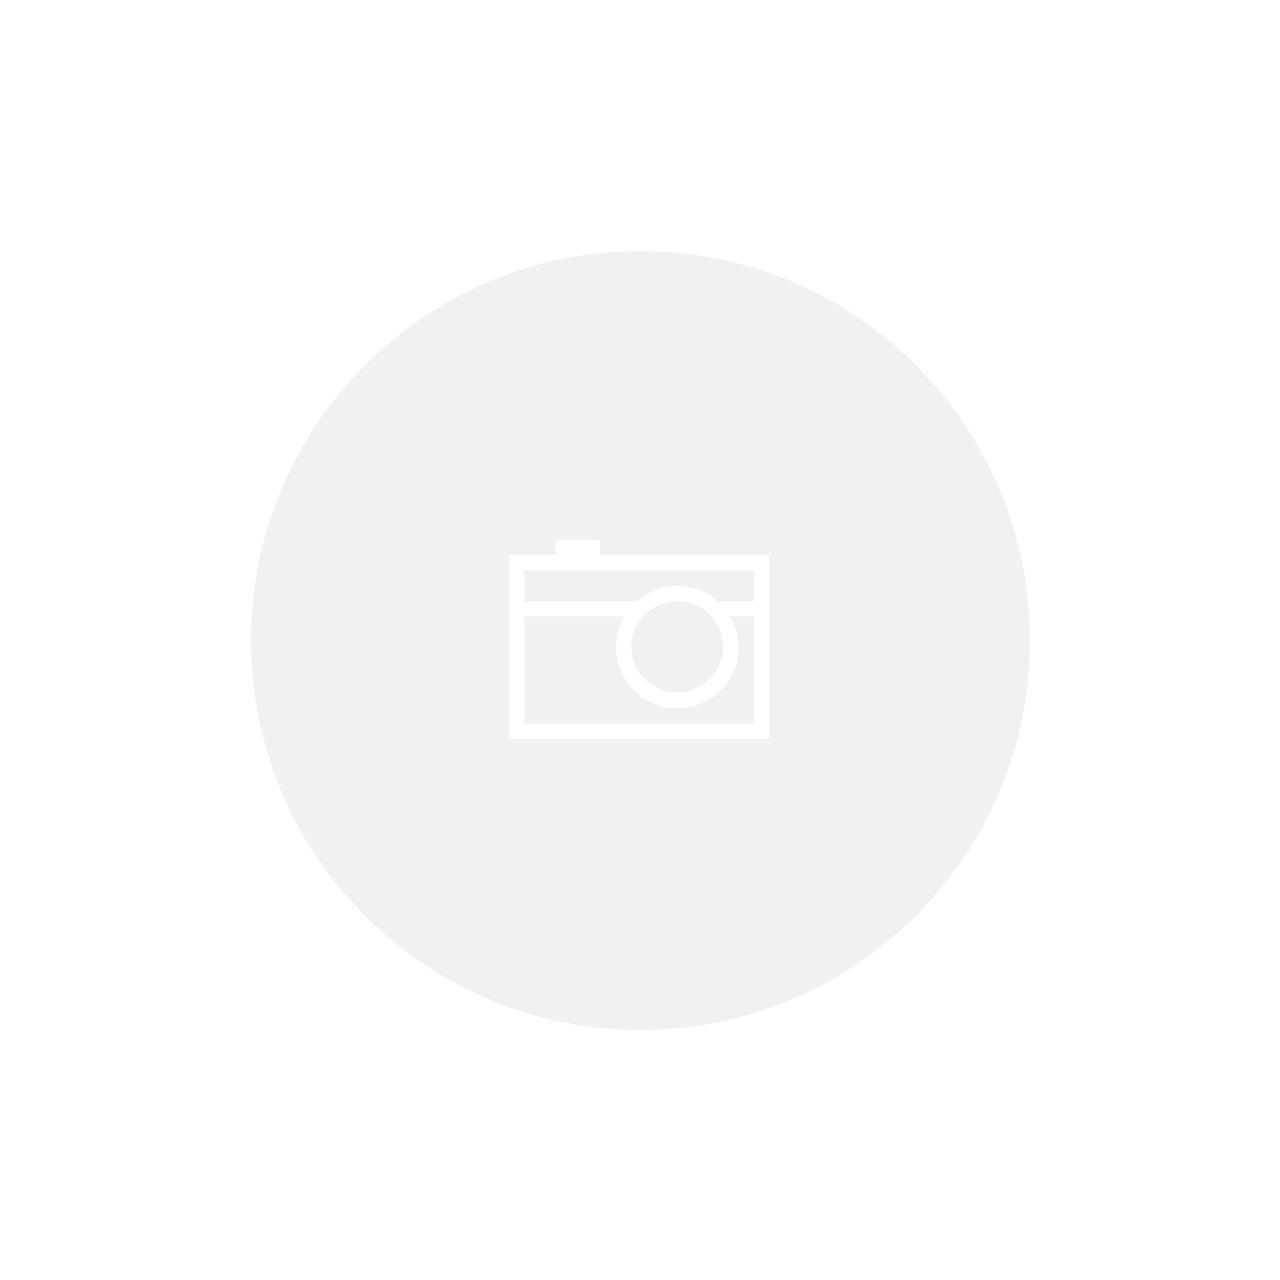 Papel Artesanal Indiano - Ref. 54